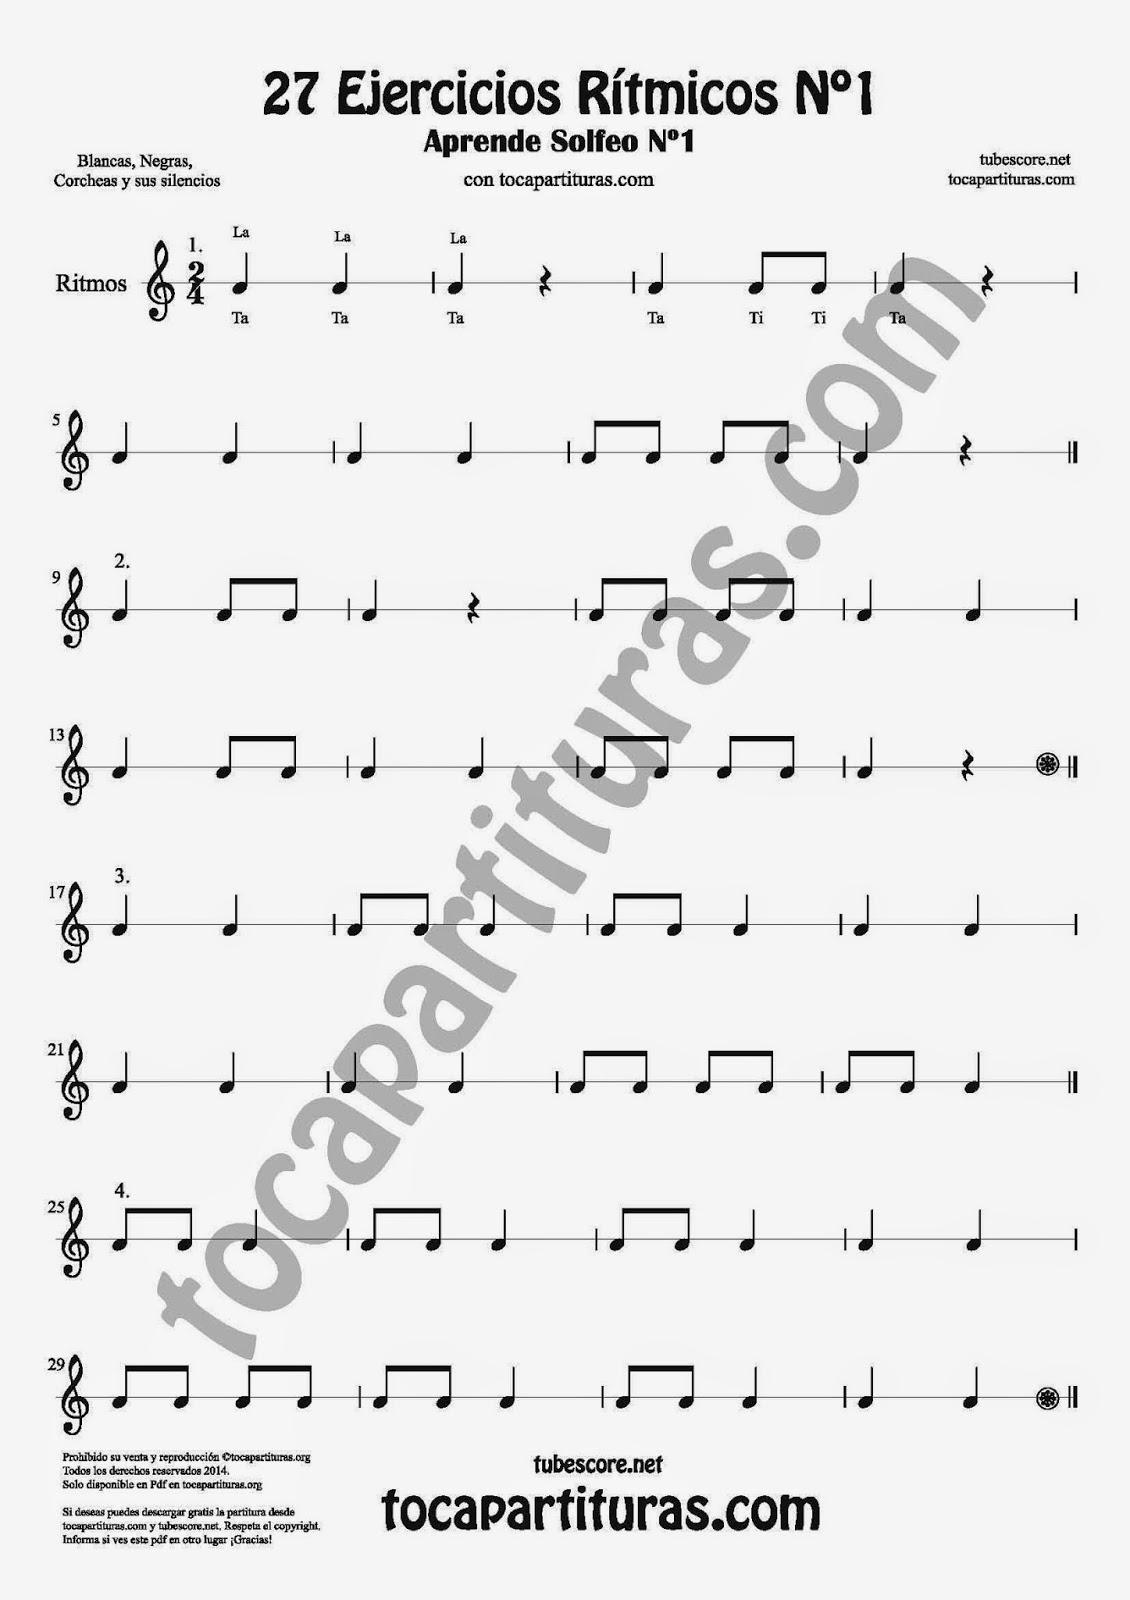 1 27 Ejercicios Rítmicos para Aprener Solfeo en el Compás de 2/4 Aprender negras, corcheas, blancas y sus silencios. Easy Rithm Sheet Music for quarter notes, half notes, 1/8 notes and silences